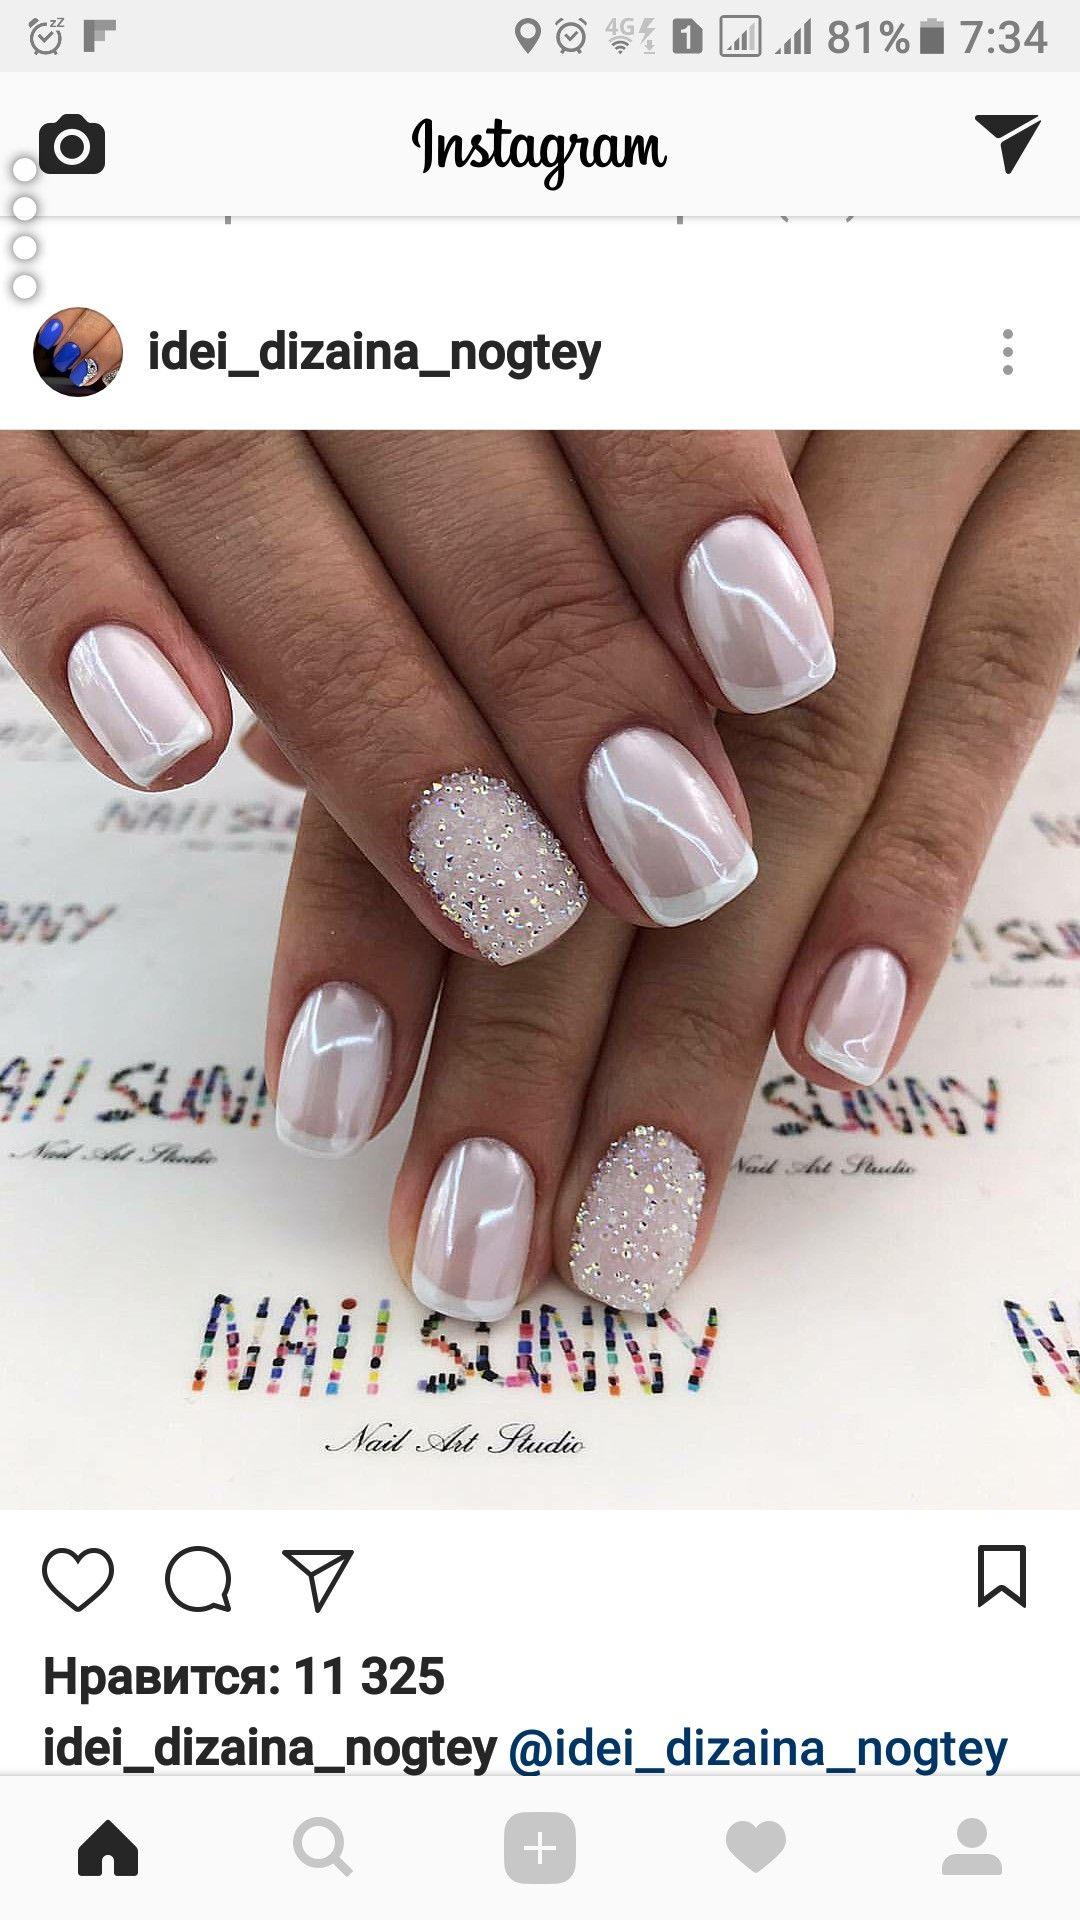 Pin by Лариса Восякова on ногти | Pinterest | Makeup, Manicure and ...